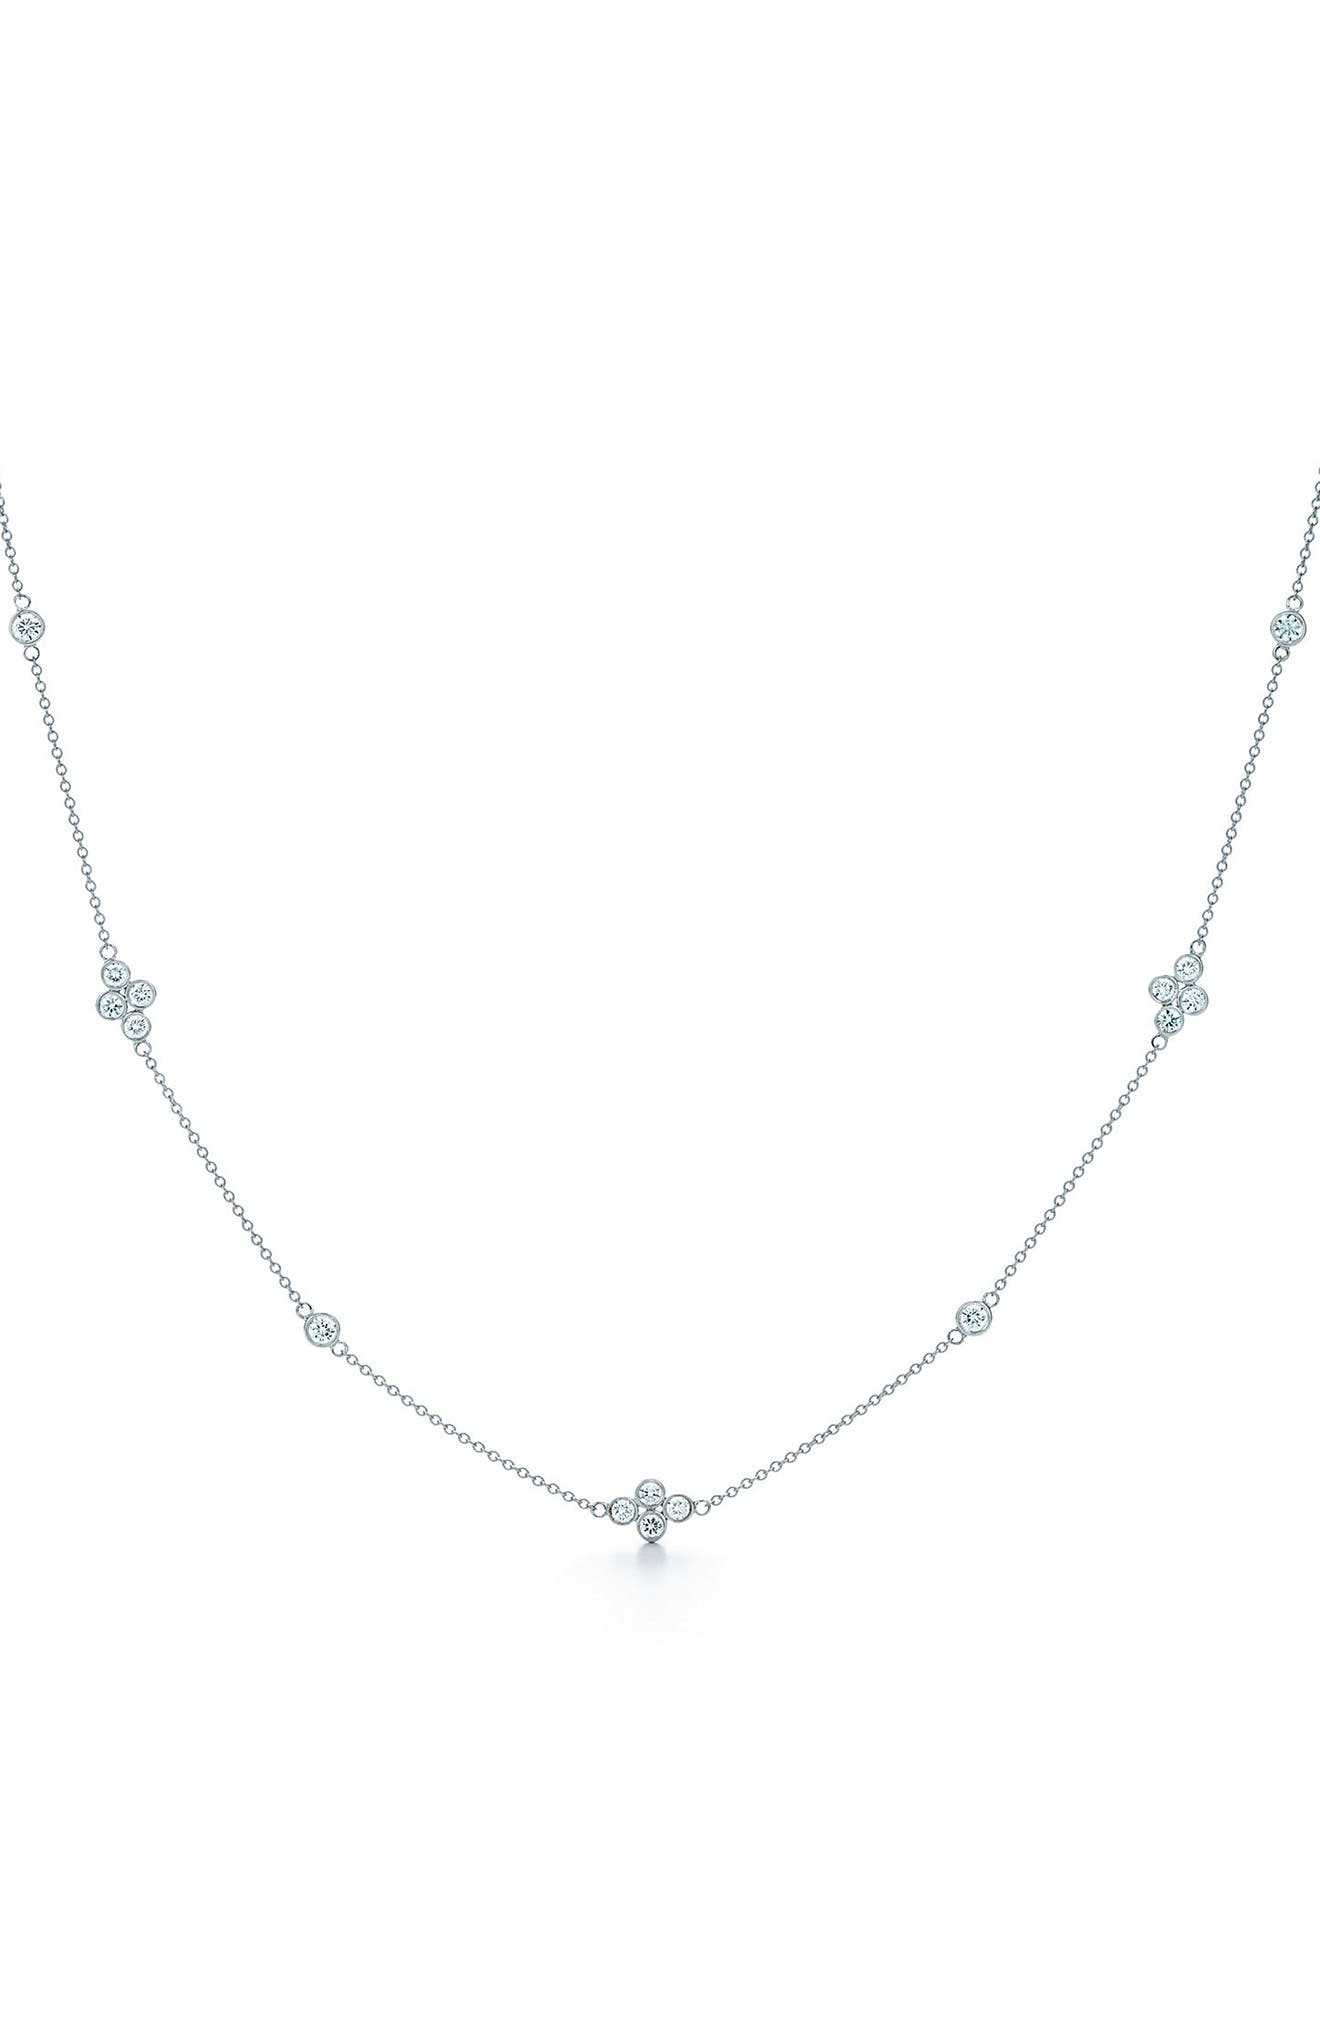 Main Image - Kwiat Diamond Collar Necklace